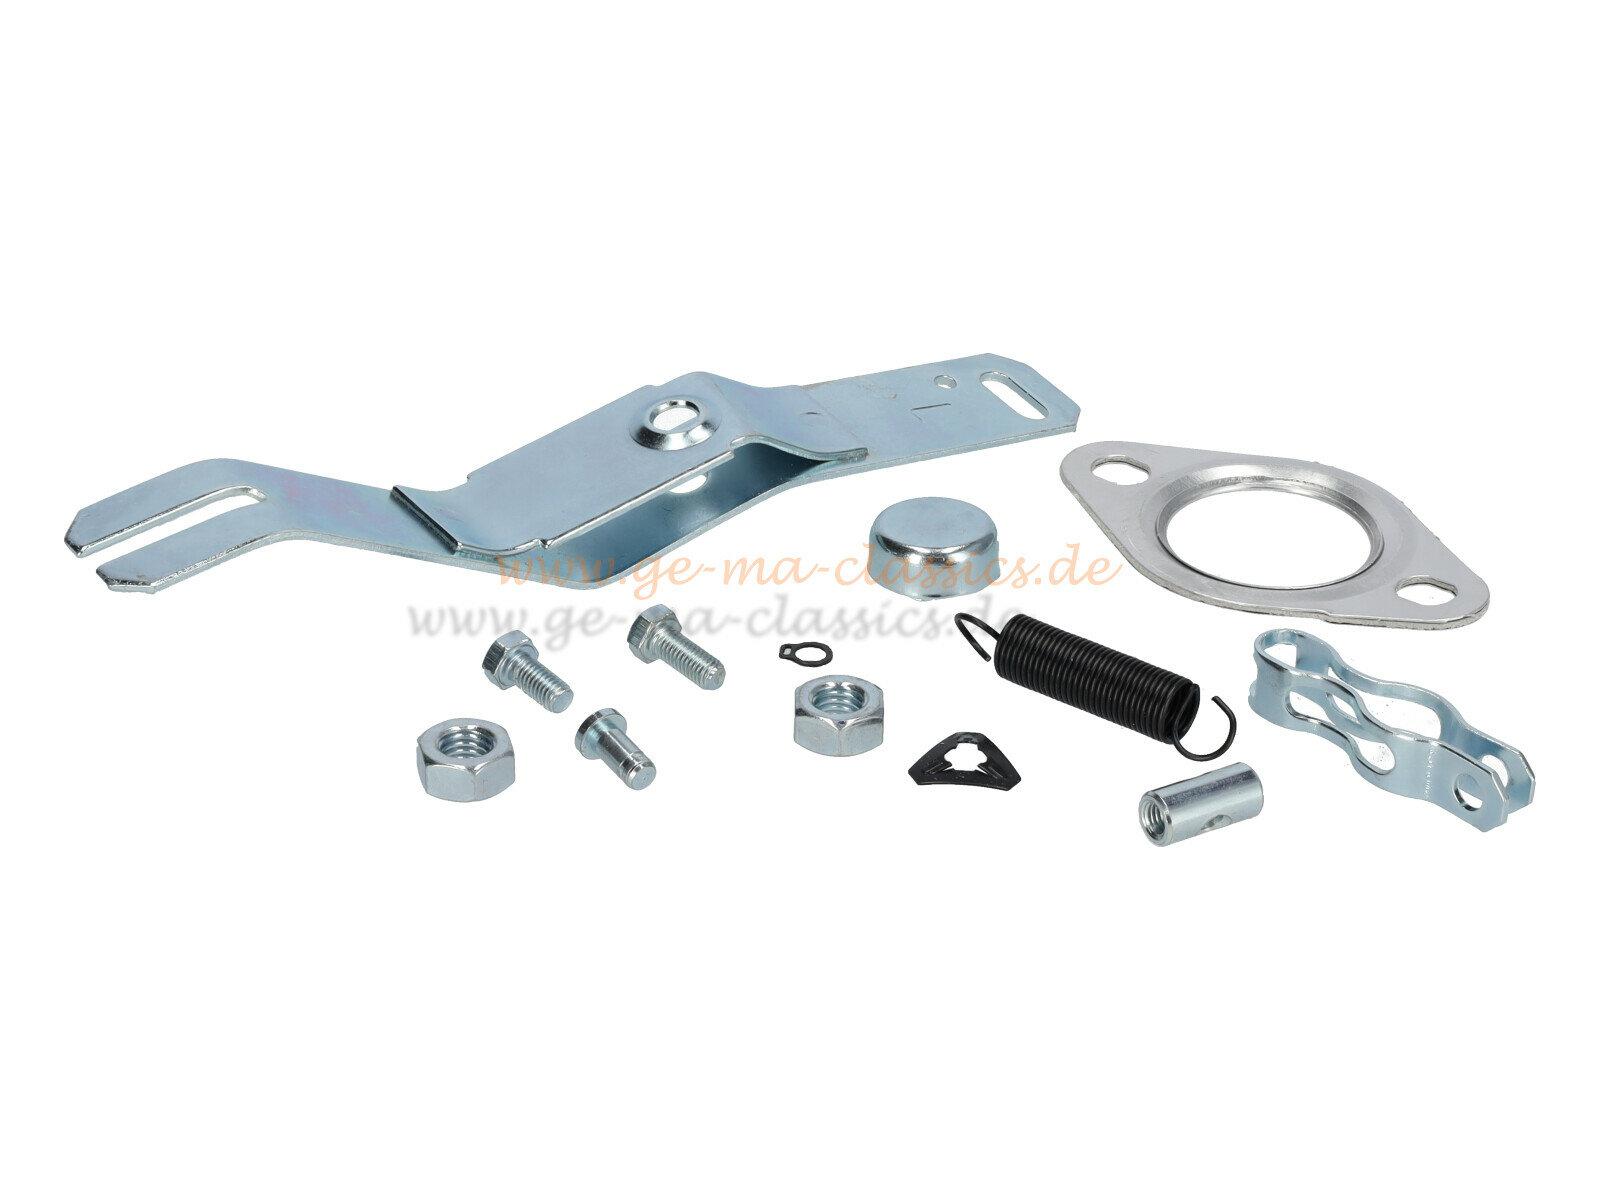 Wärmetauscher Anbausatz für VW Käfer Karmann links Repro